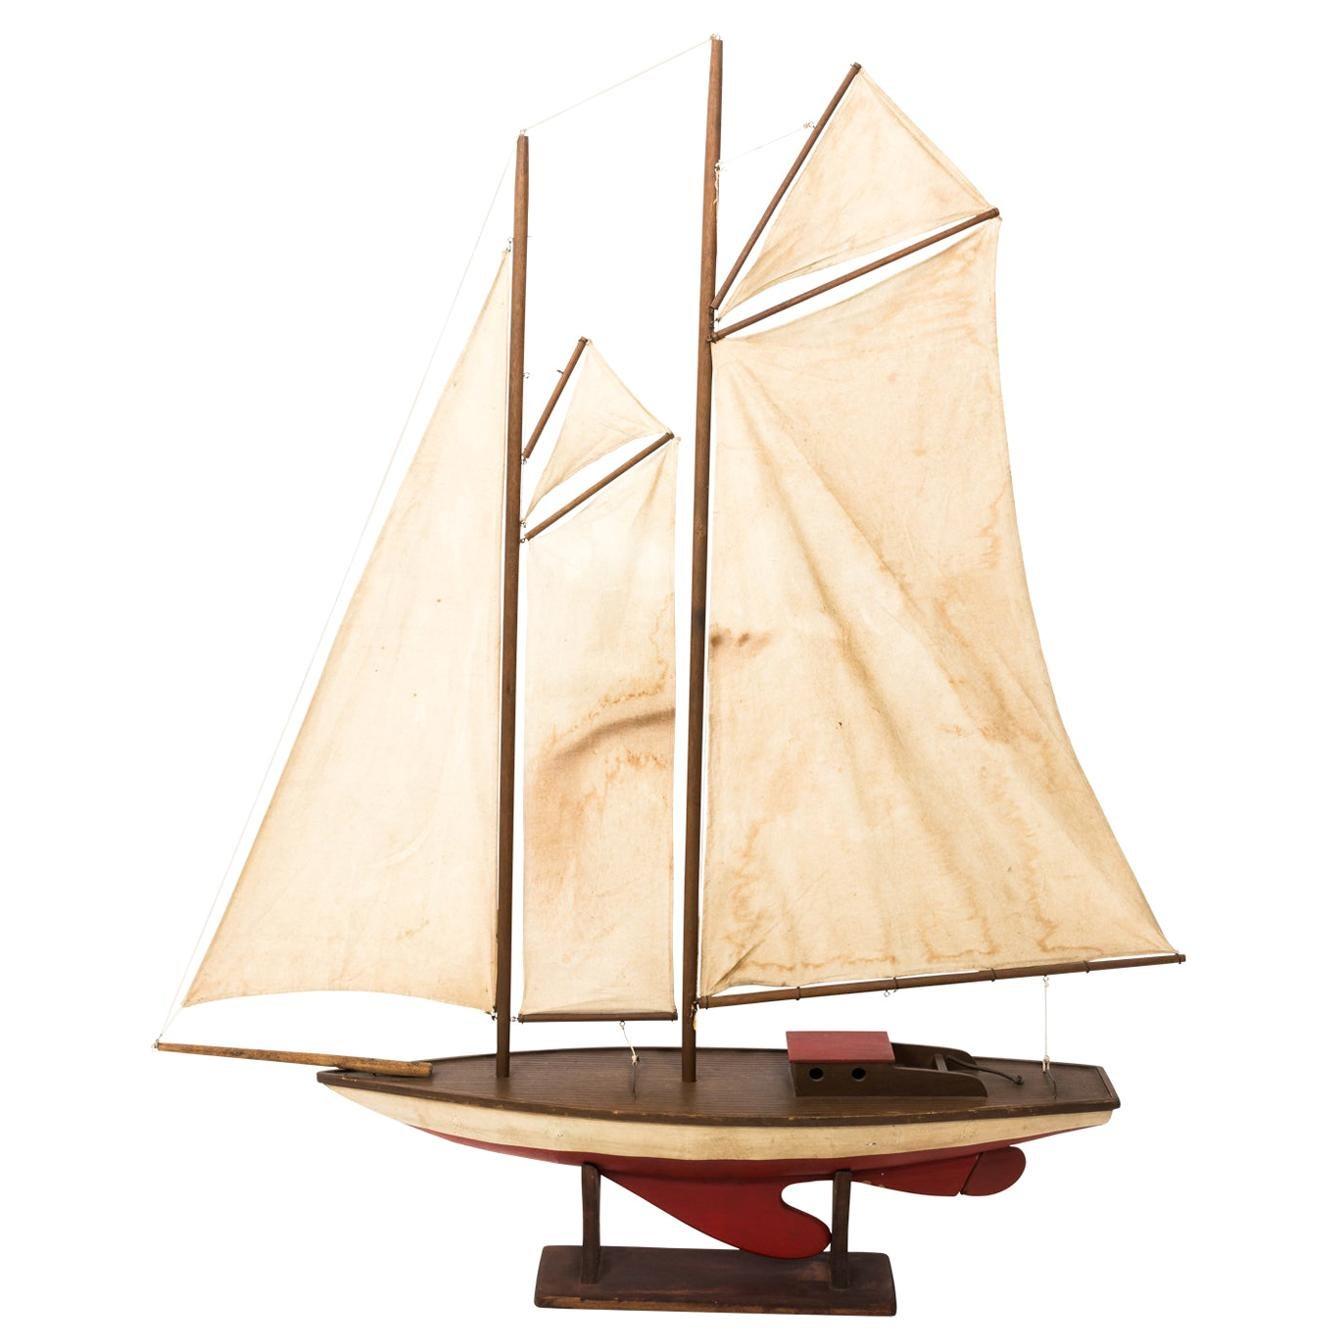 Vintage Schooner Sailboat Model, circa 1950s